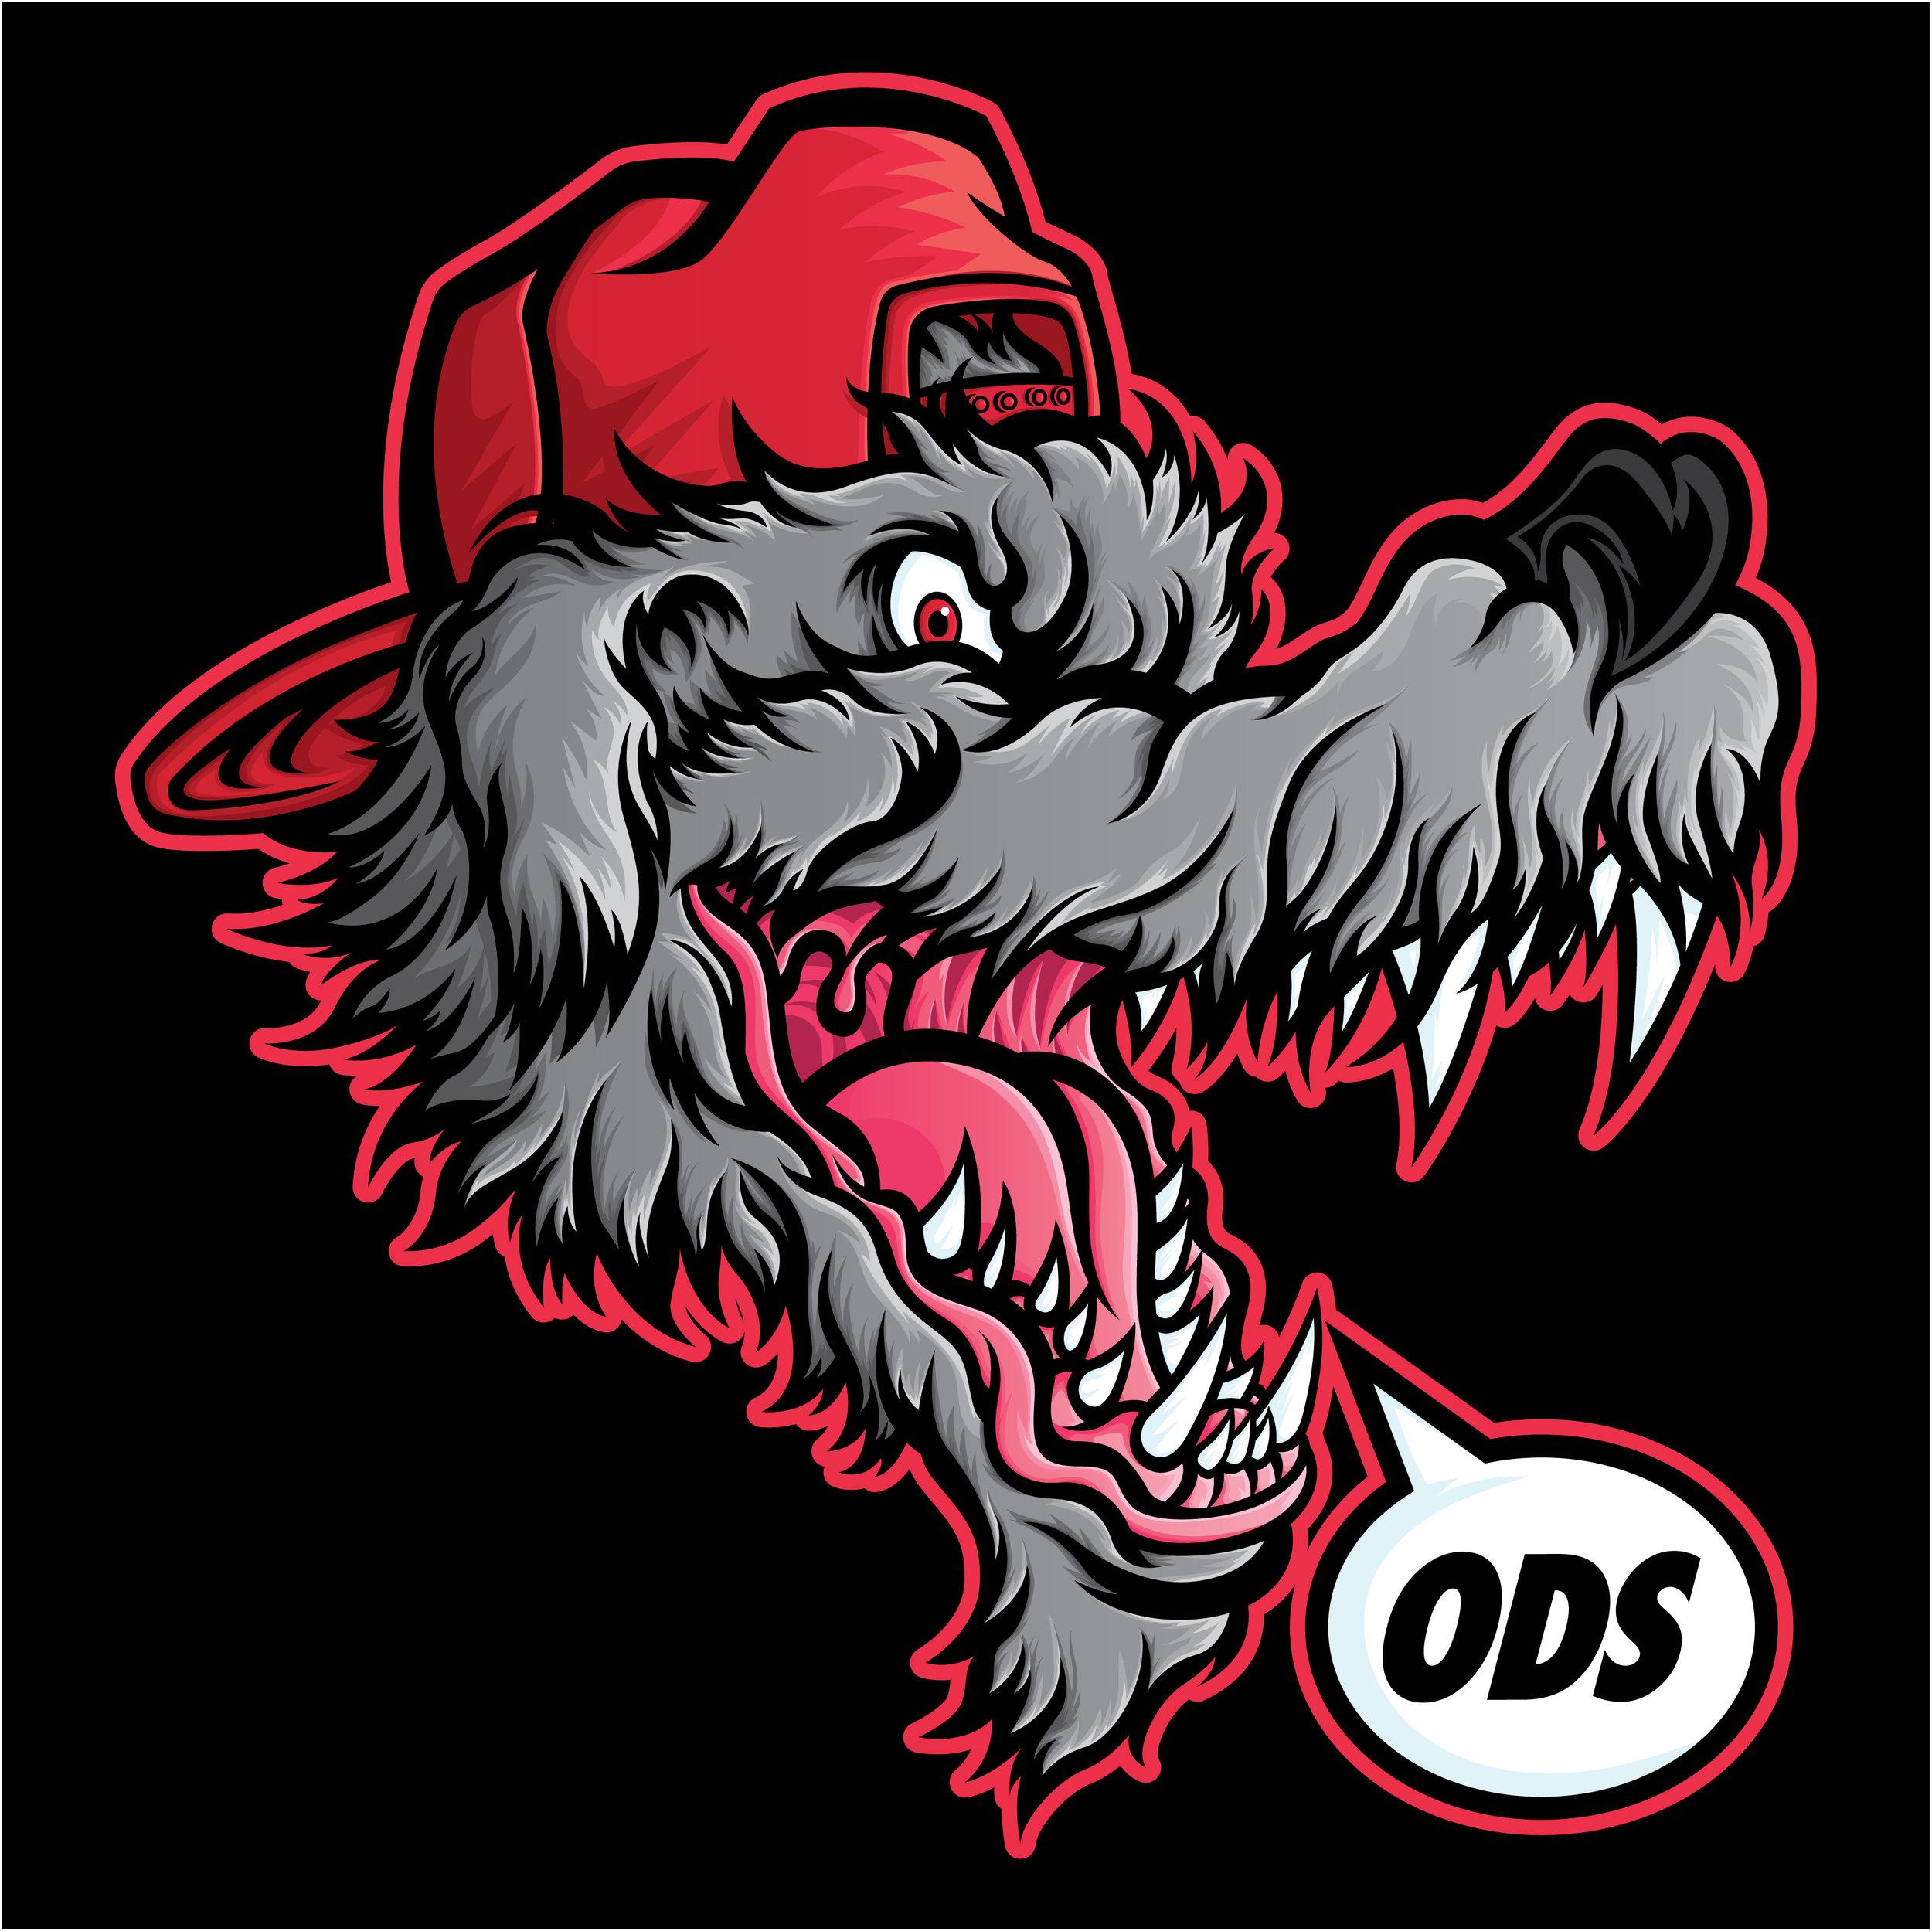 ODS-Dog-orozcodesign-1.jpg